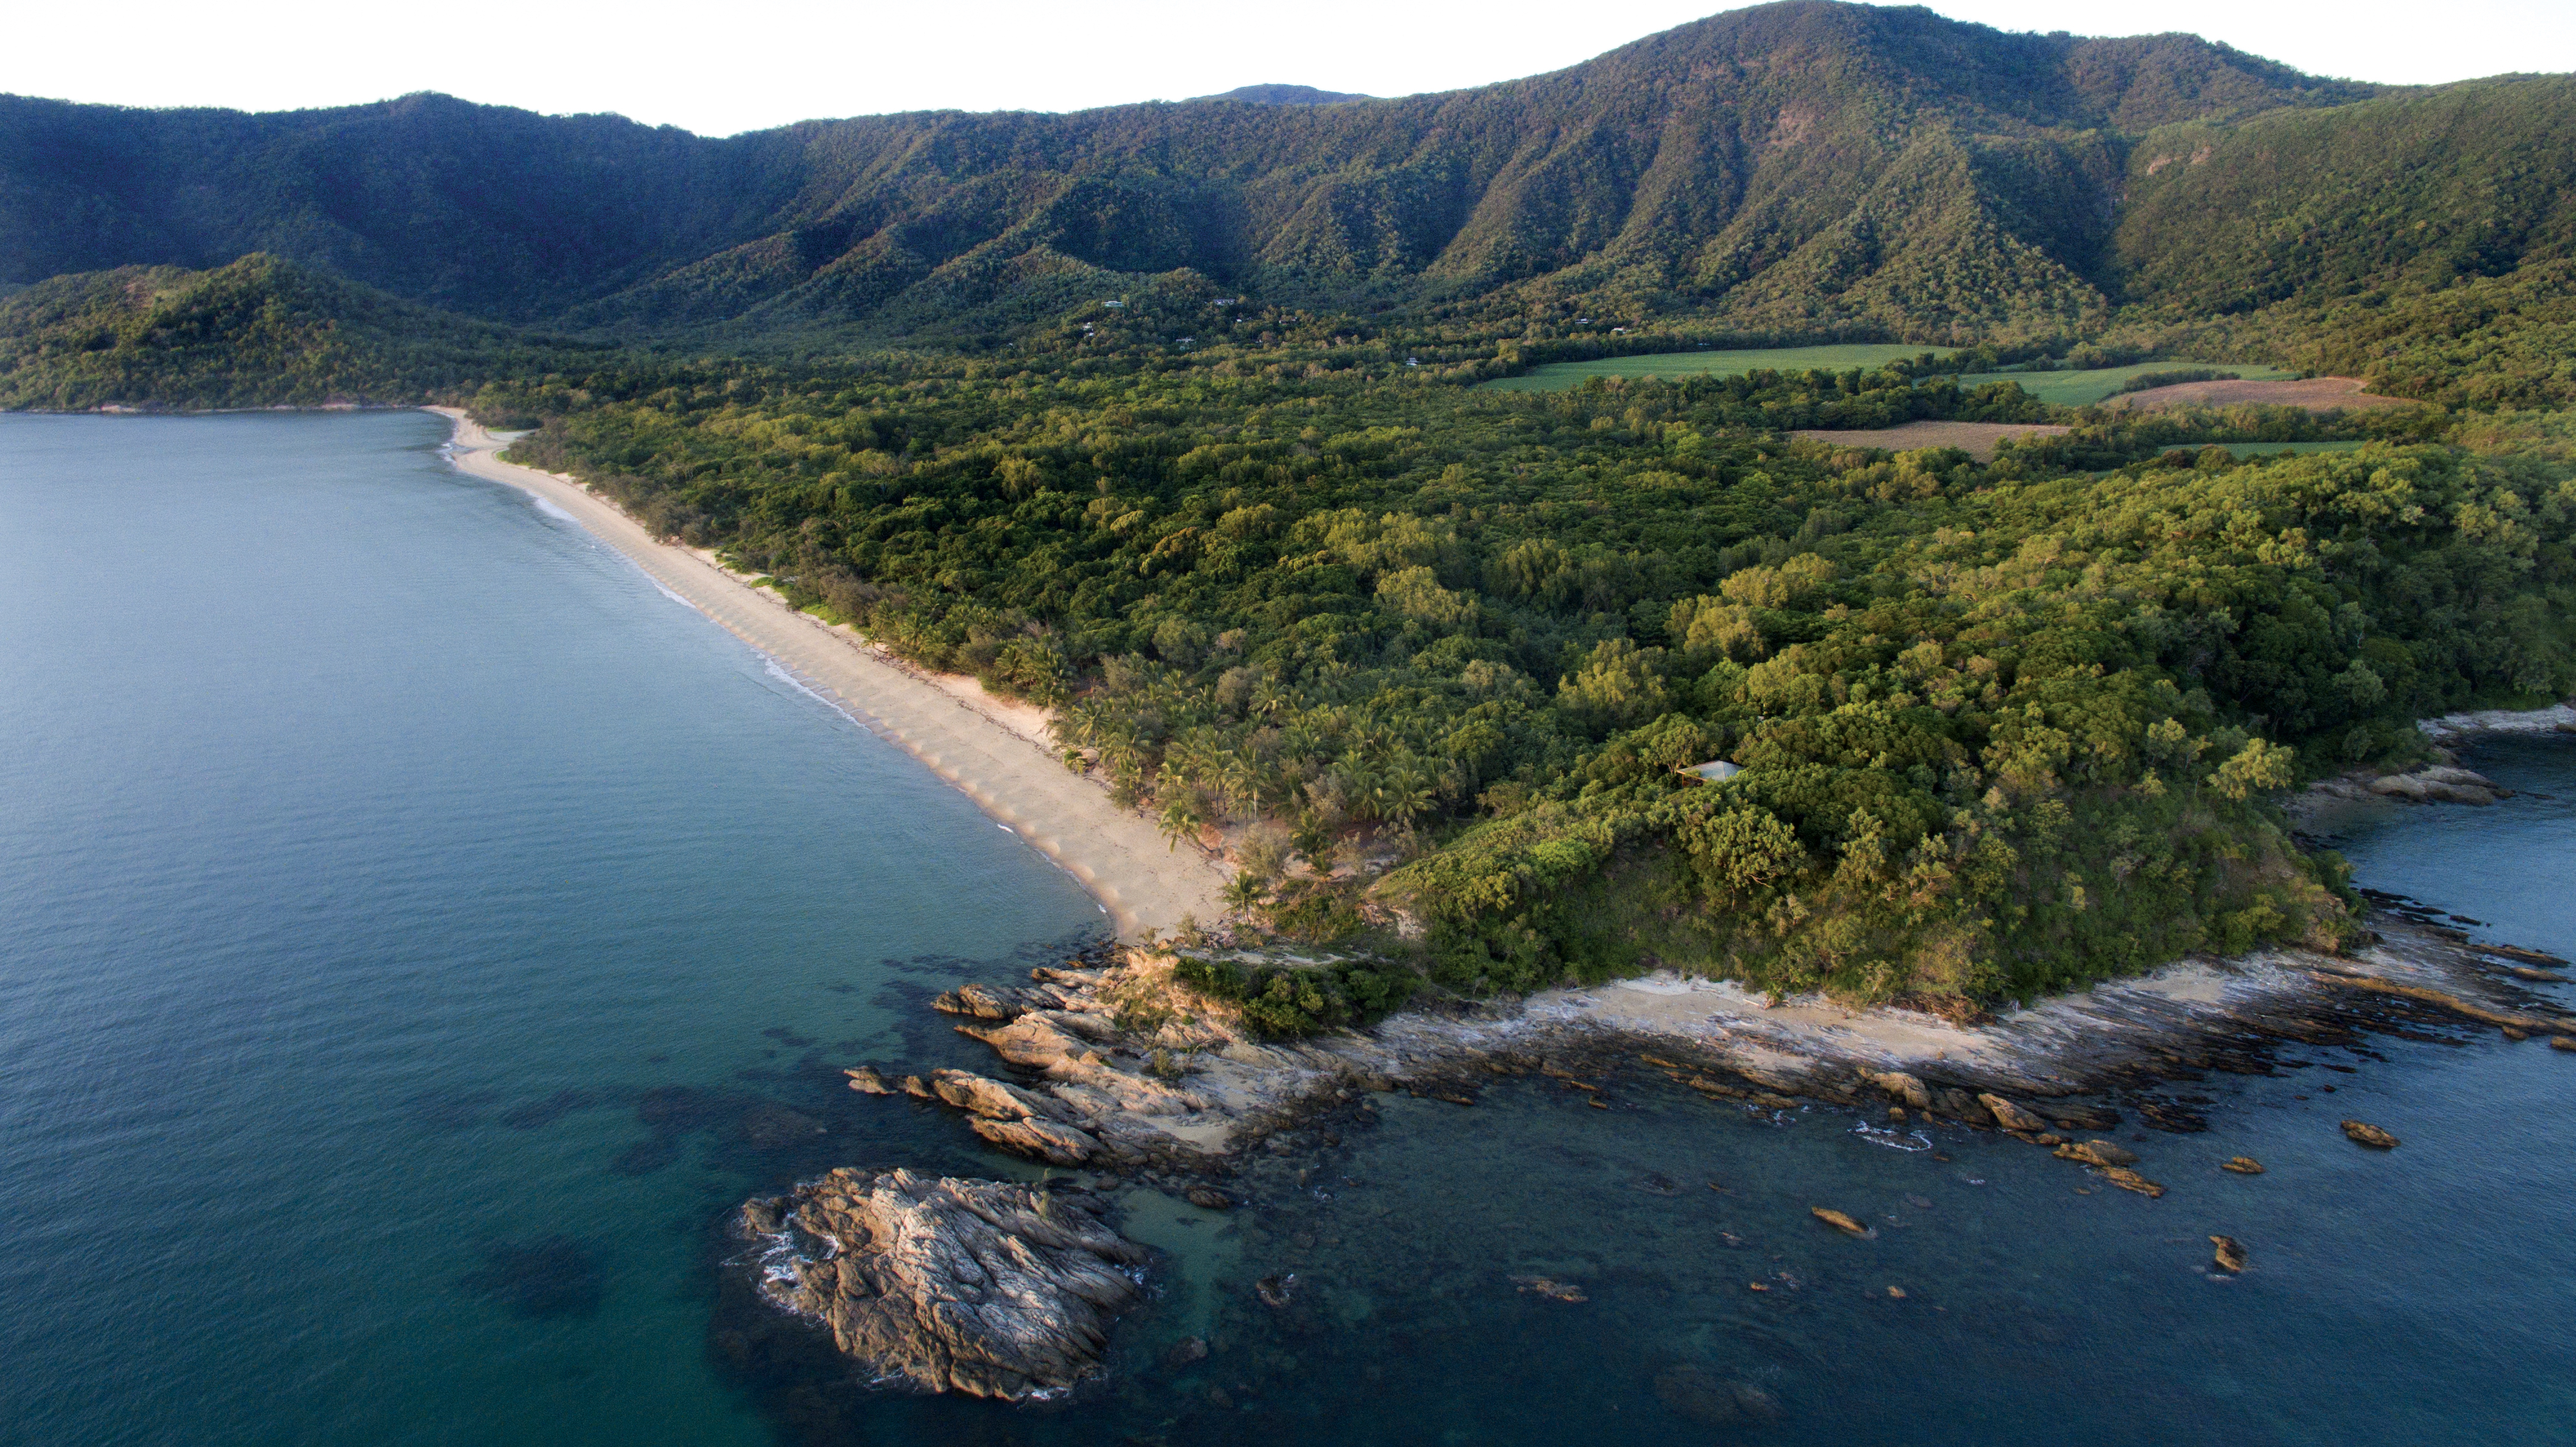 https://www.thalabeach.com.au/wp-content/uploads/2010/07/Thala_Beach_Nature_Reserve_2016__172.jpg